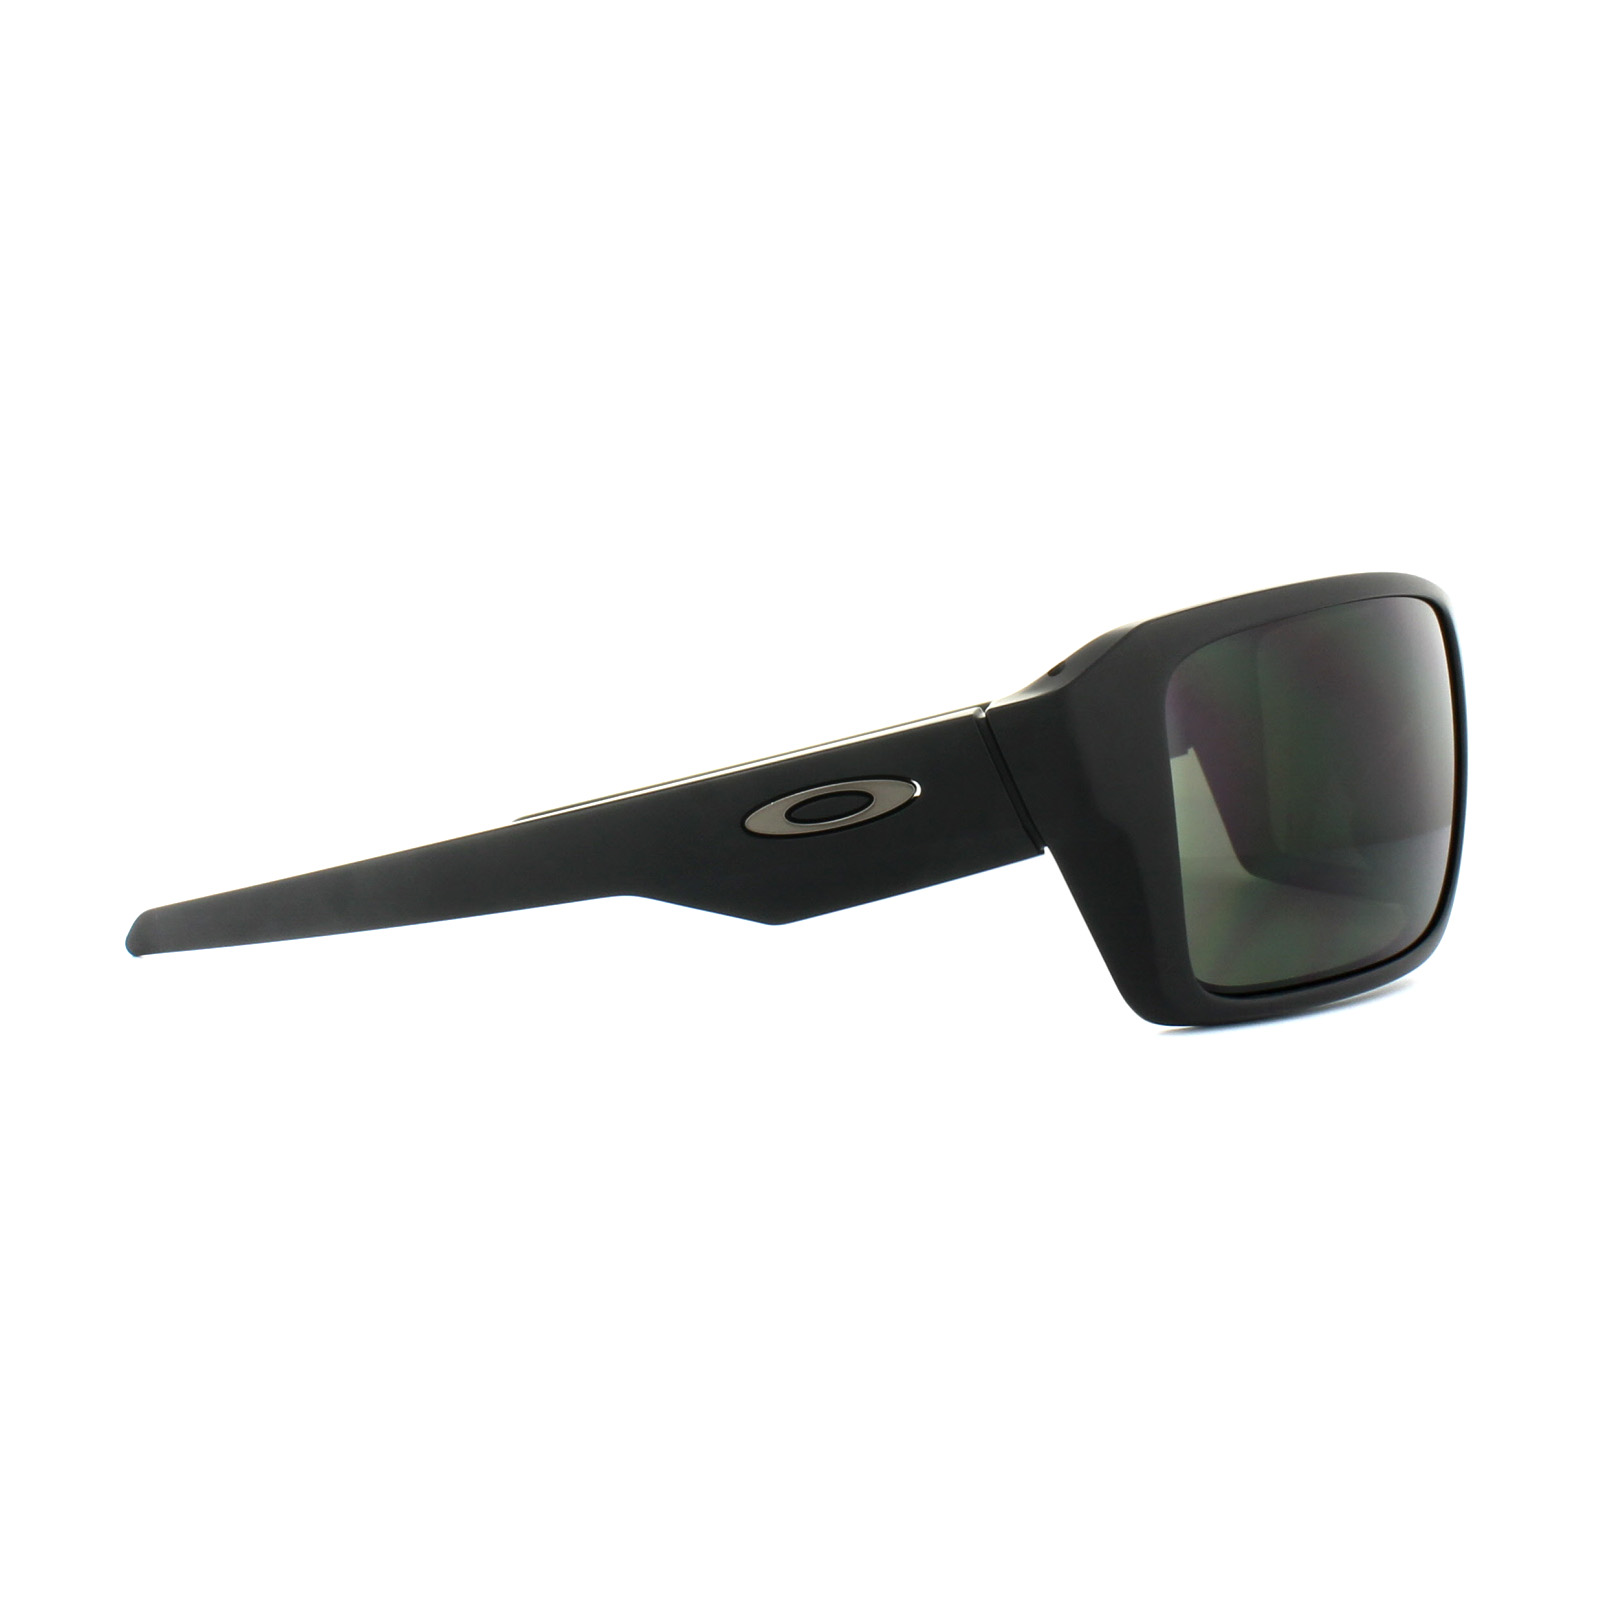 c5cd262e8a Sentinel Oakley Sunglasses Double Edge OO9380-01 Matt Black Dark Grey